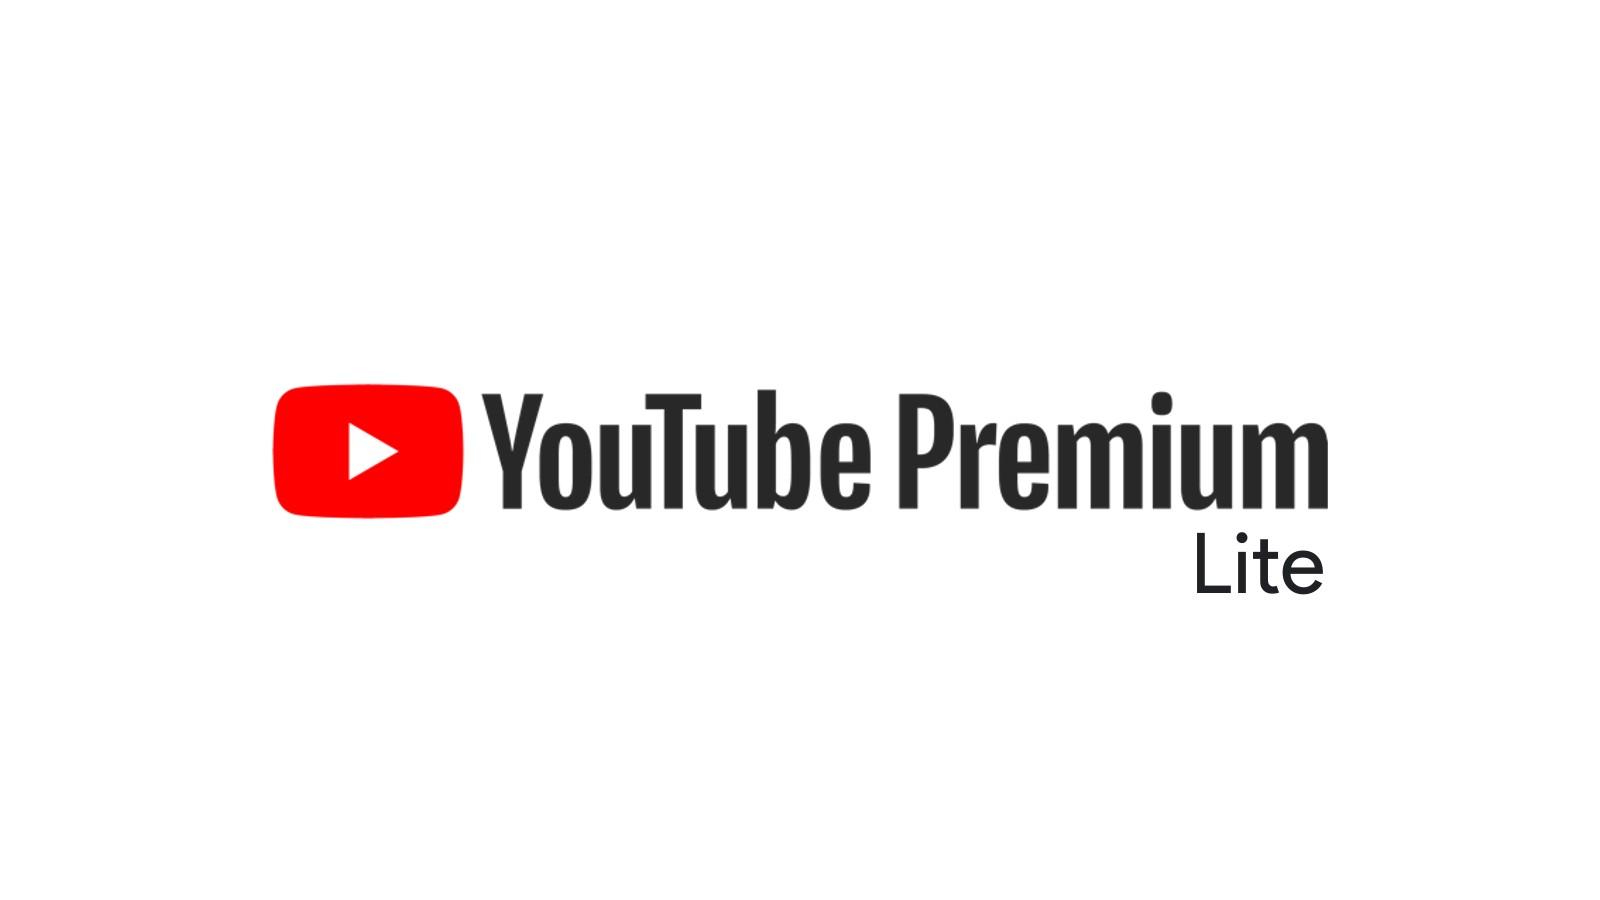 YouTube Premium Lite: Προσιτή συνδρομή χωρίς διαφημίσεις